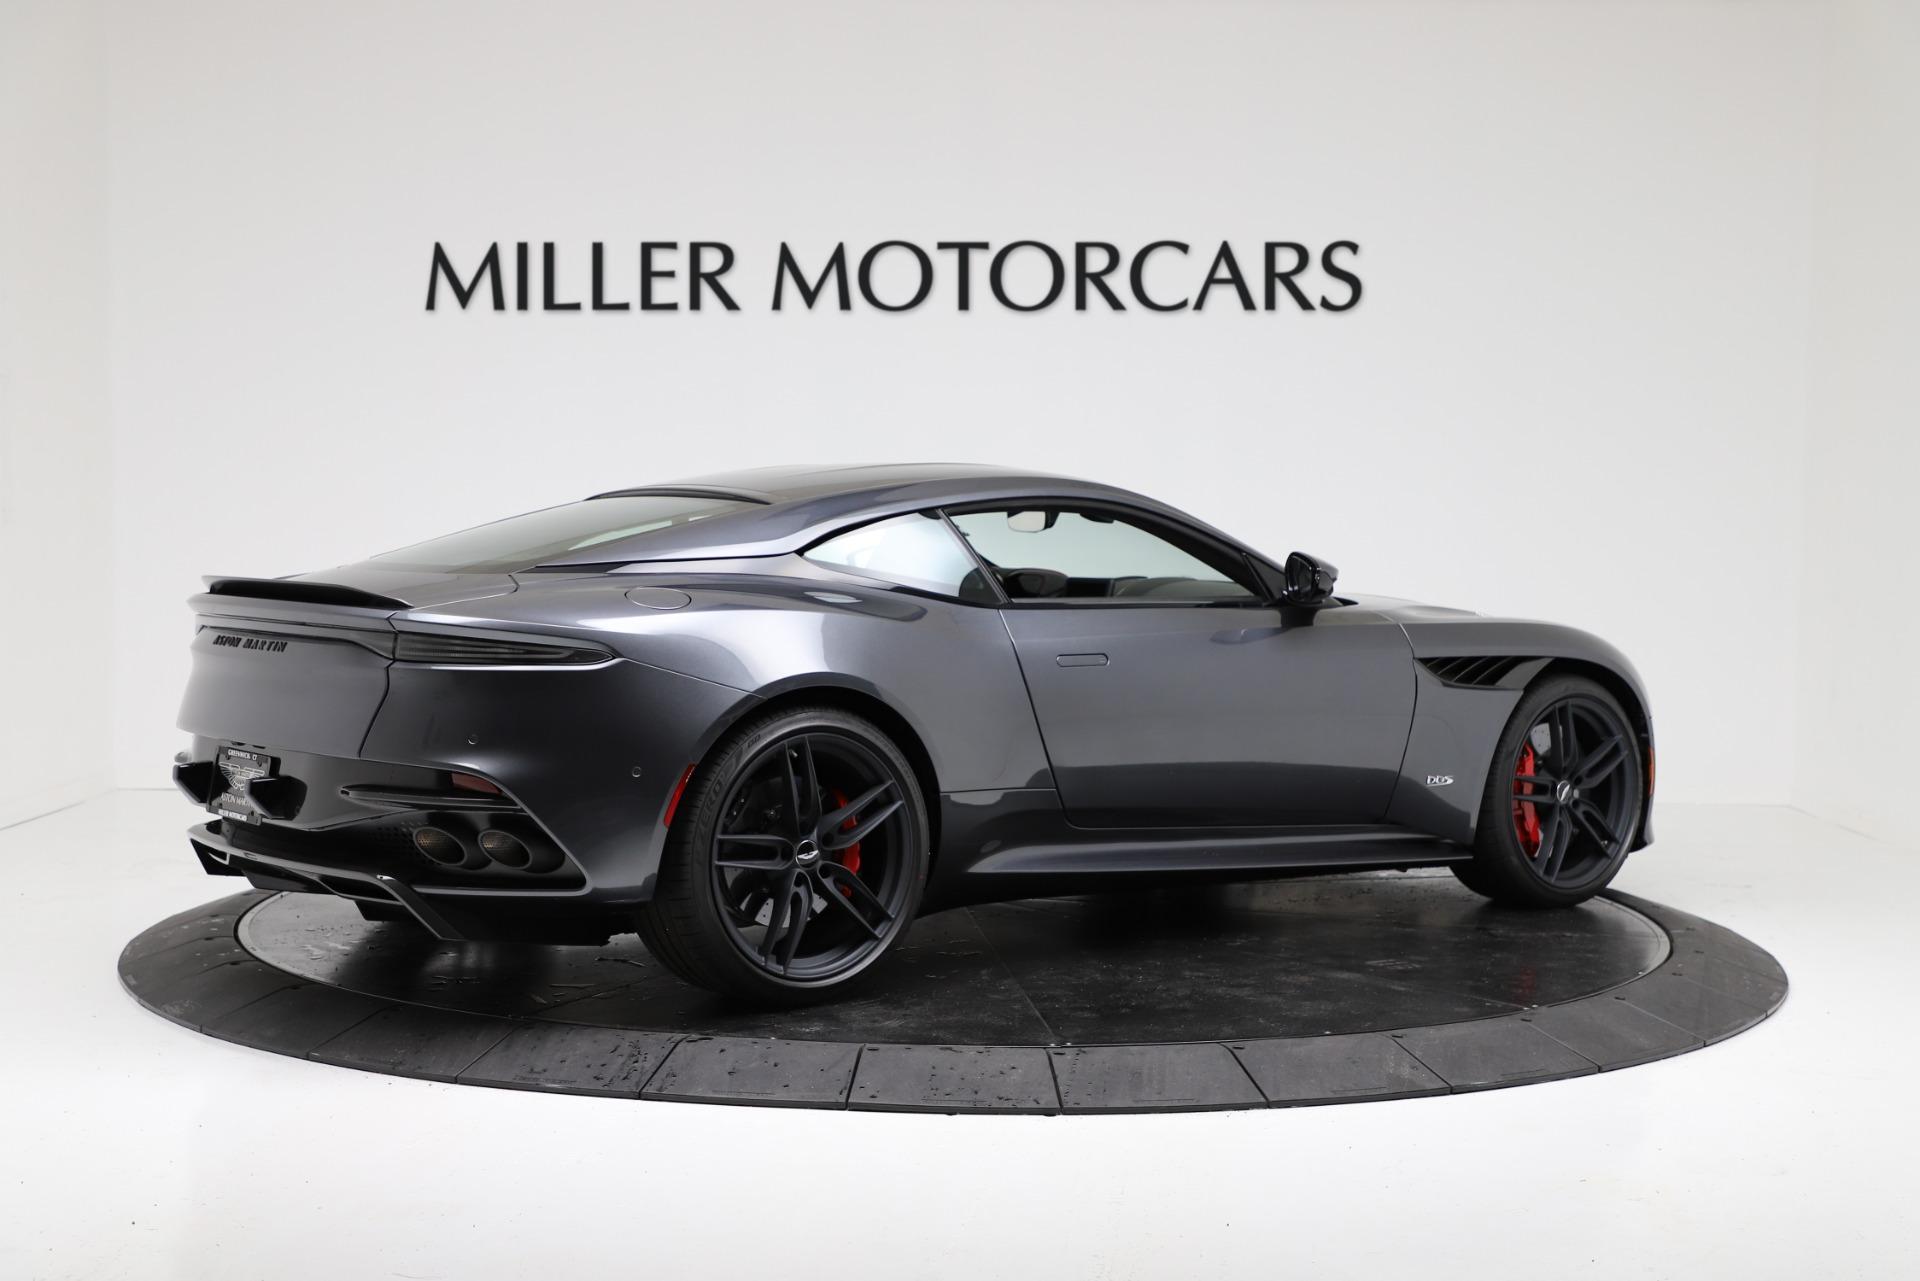 New 2019 Aston Martin DBS Superleggera For Sale In Greenwich, CT 3318_p7